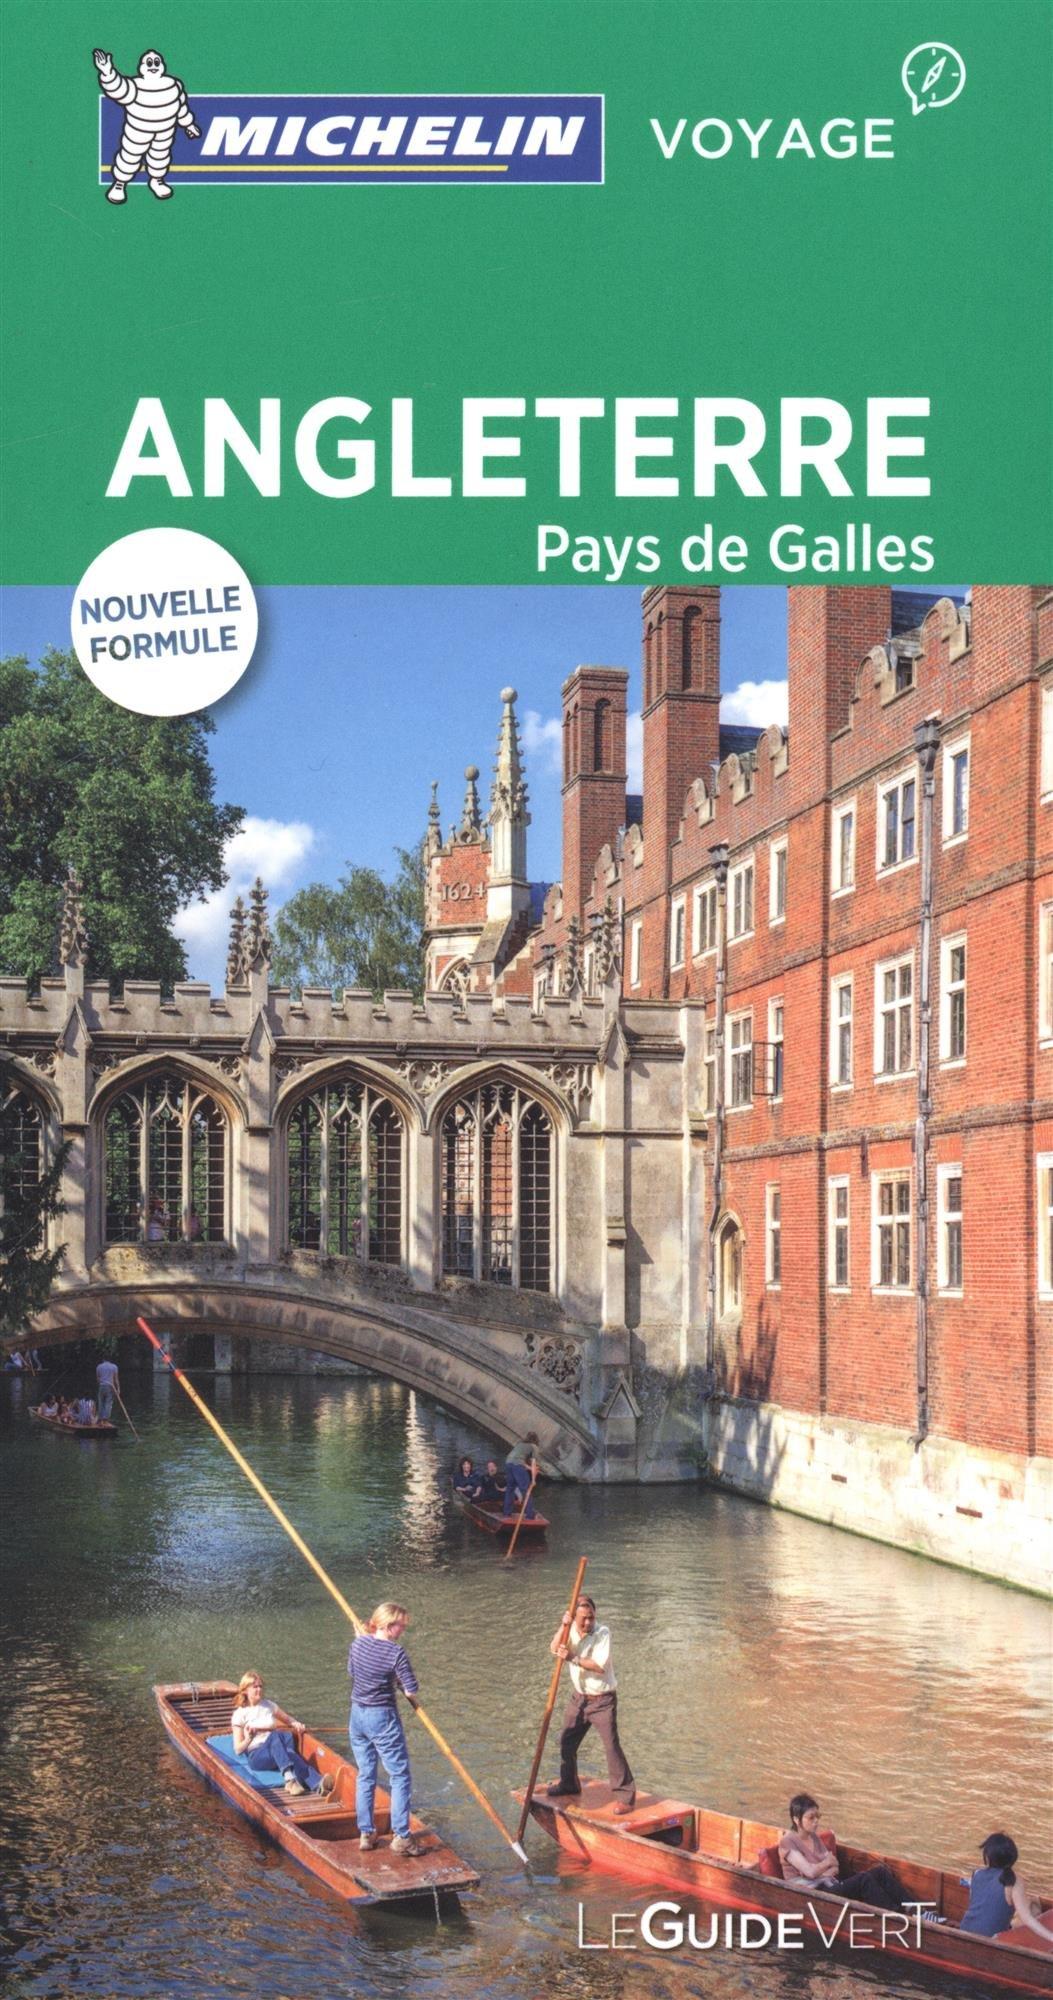 GUIDE VERT - ANGLETERRE, PAYS DE GALLES